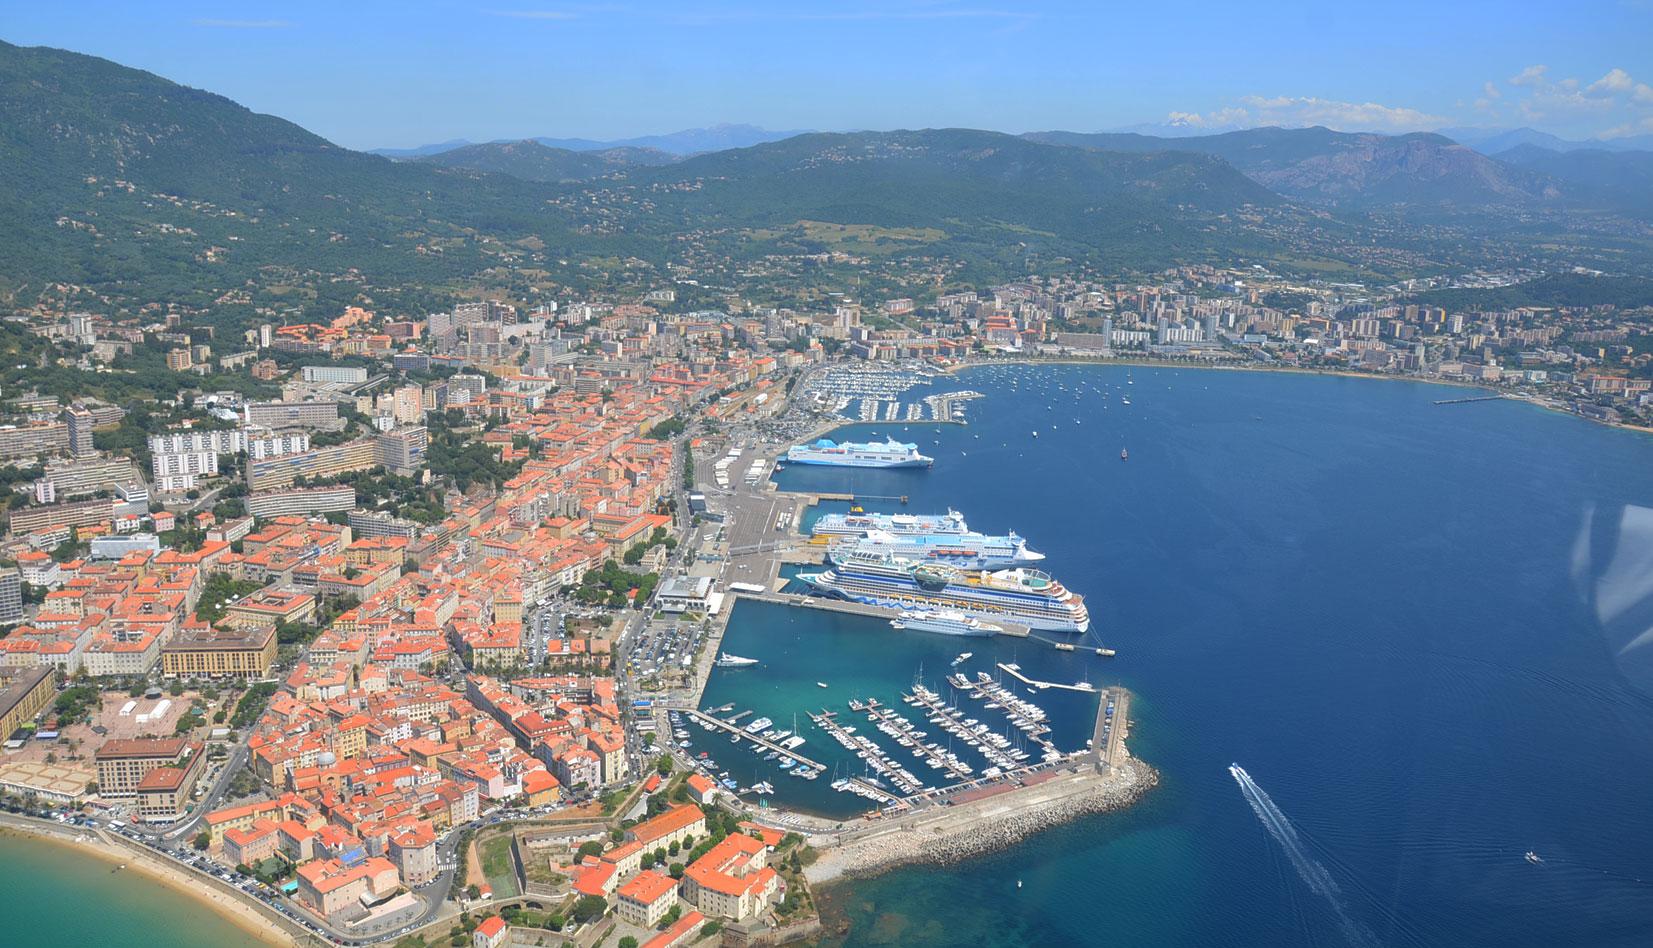 La base d 39 ajaccio absolute yacht - Location voiture bastia port ...